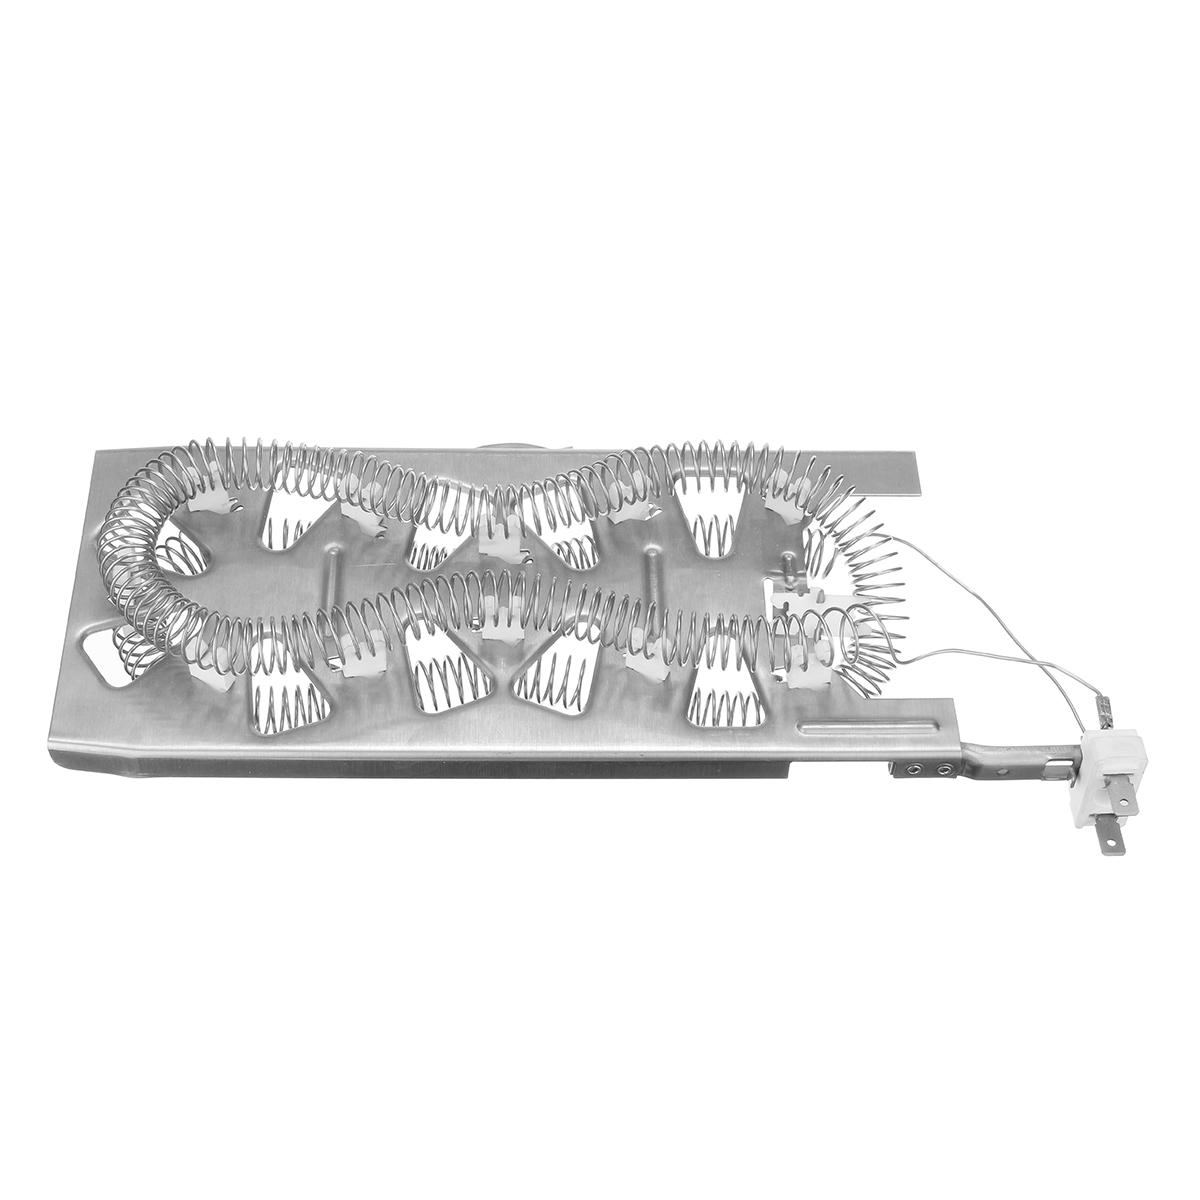 Wiring Diagram For Kenmore Dryer 3387747 Database Heating Element Metal Ap2947033 Ps344597 Whirlpool Schematic